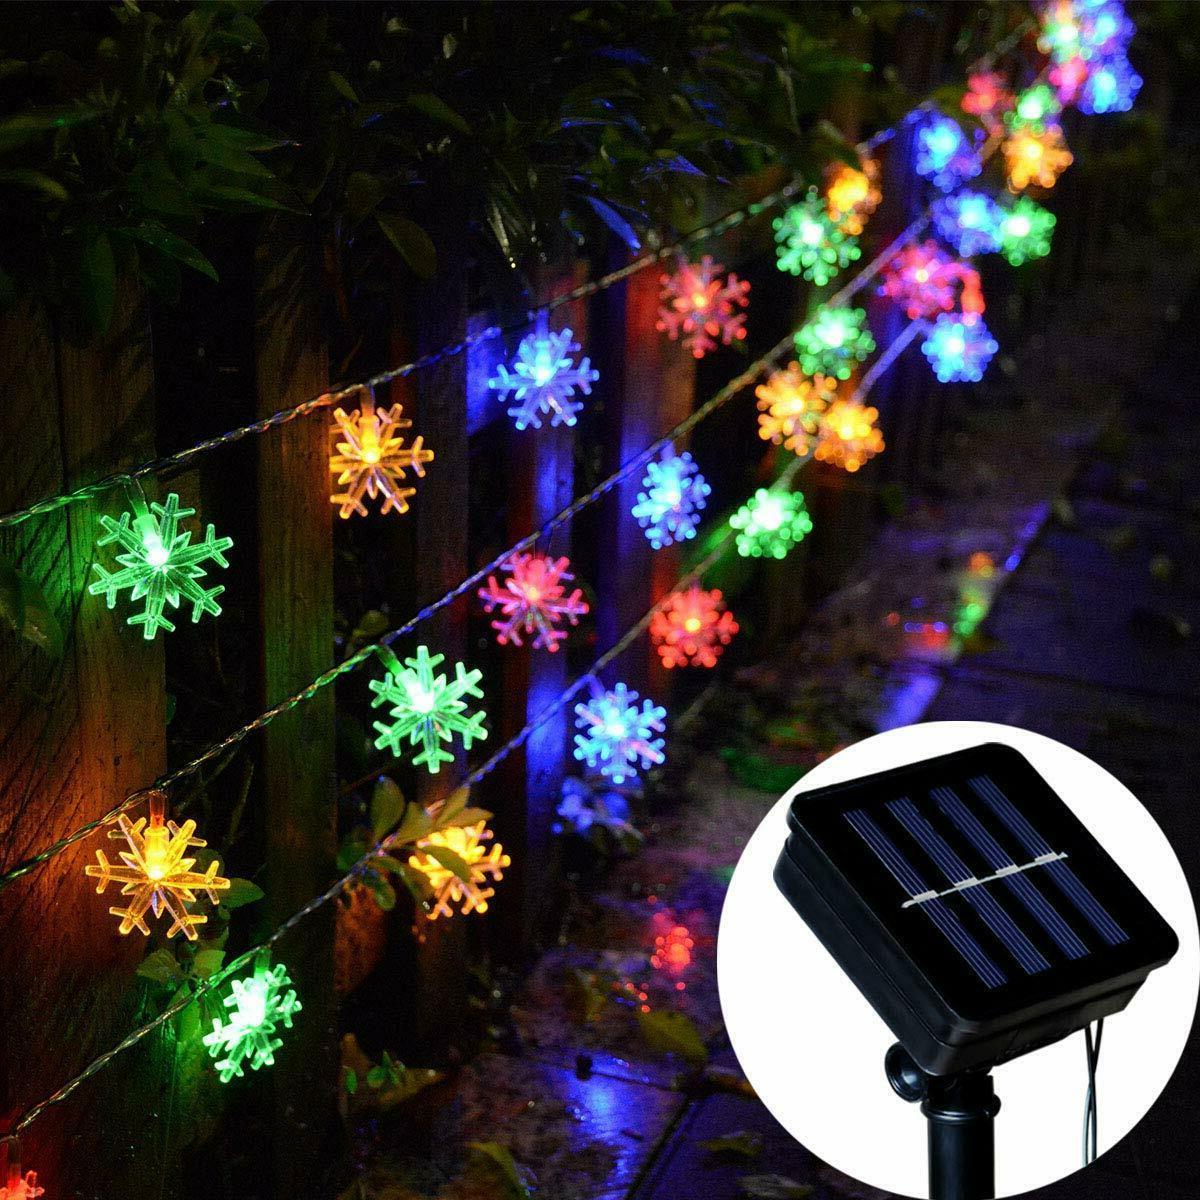 solar powered snowflake string fairy lights xmas